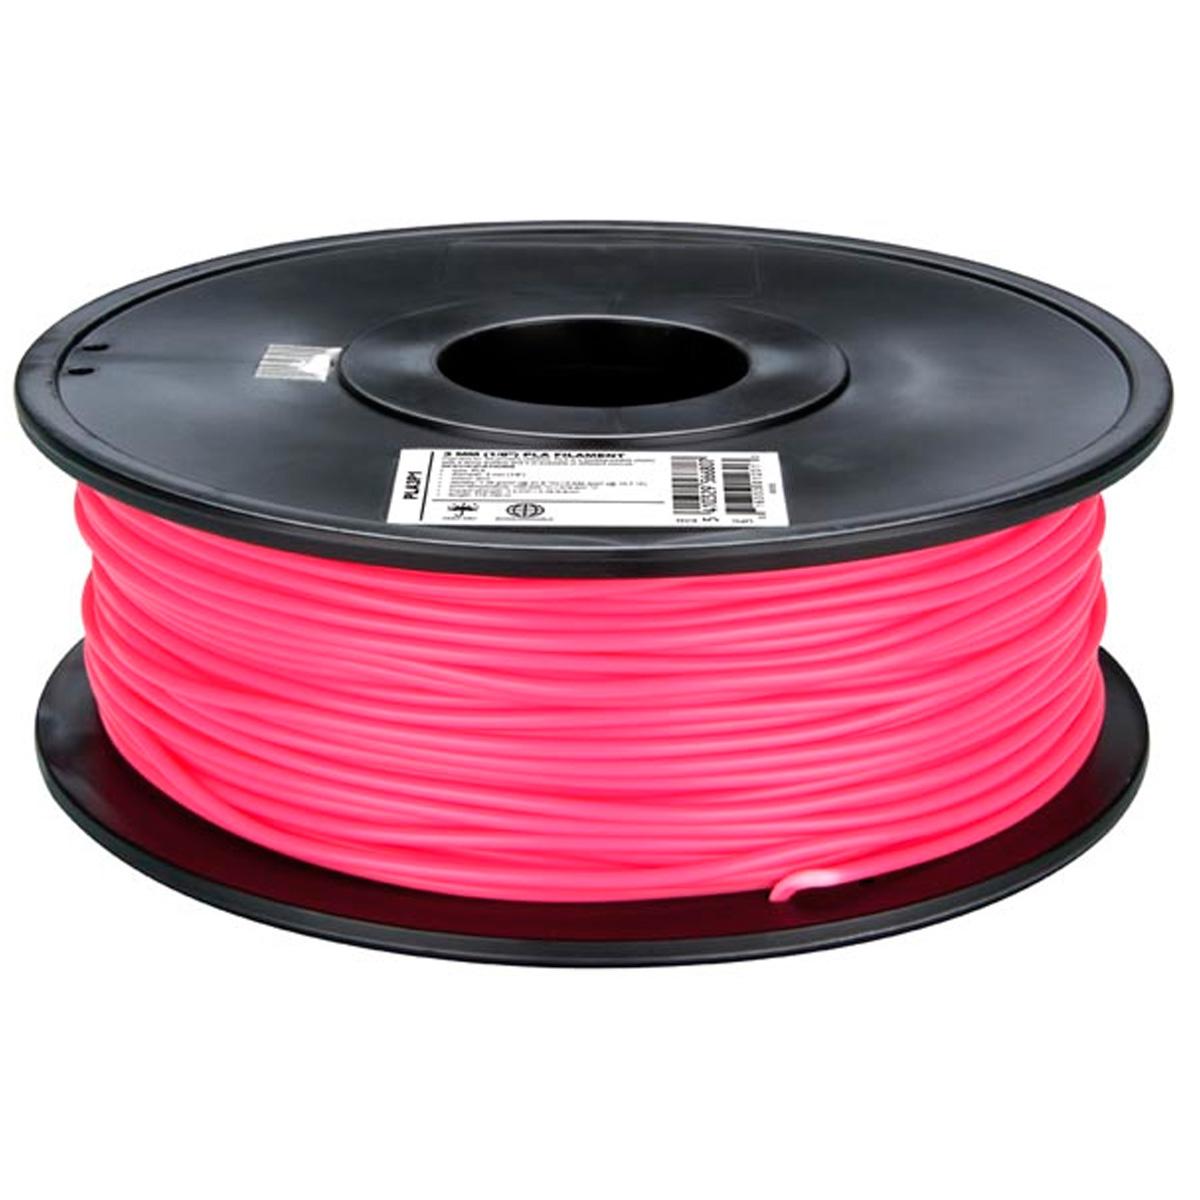 filamento pla 3mm rosa 1 kg impresora 3d impresora